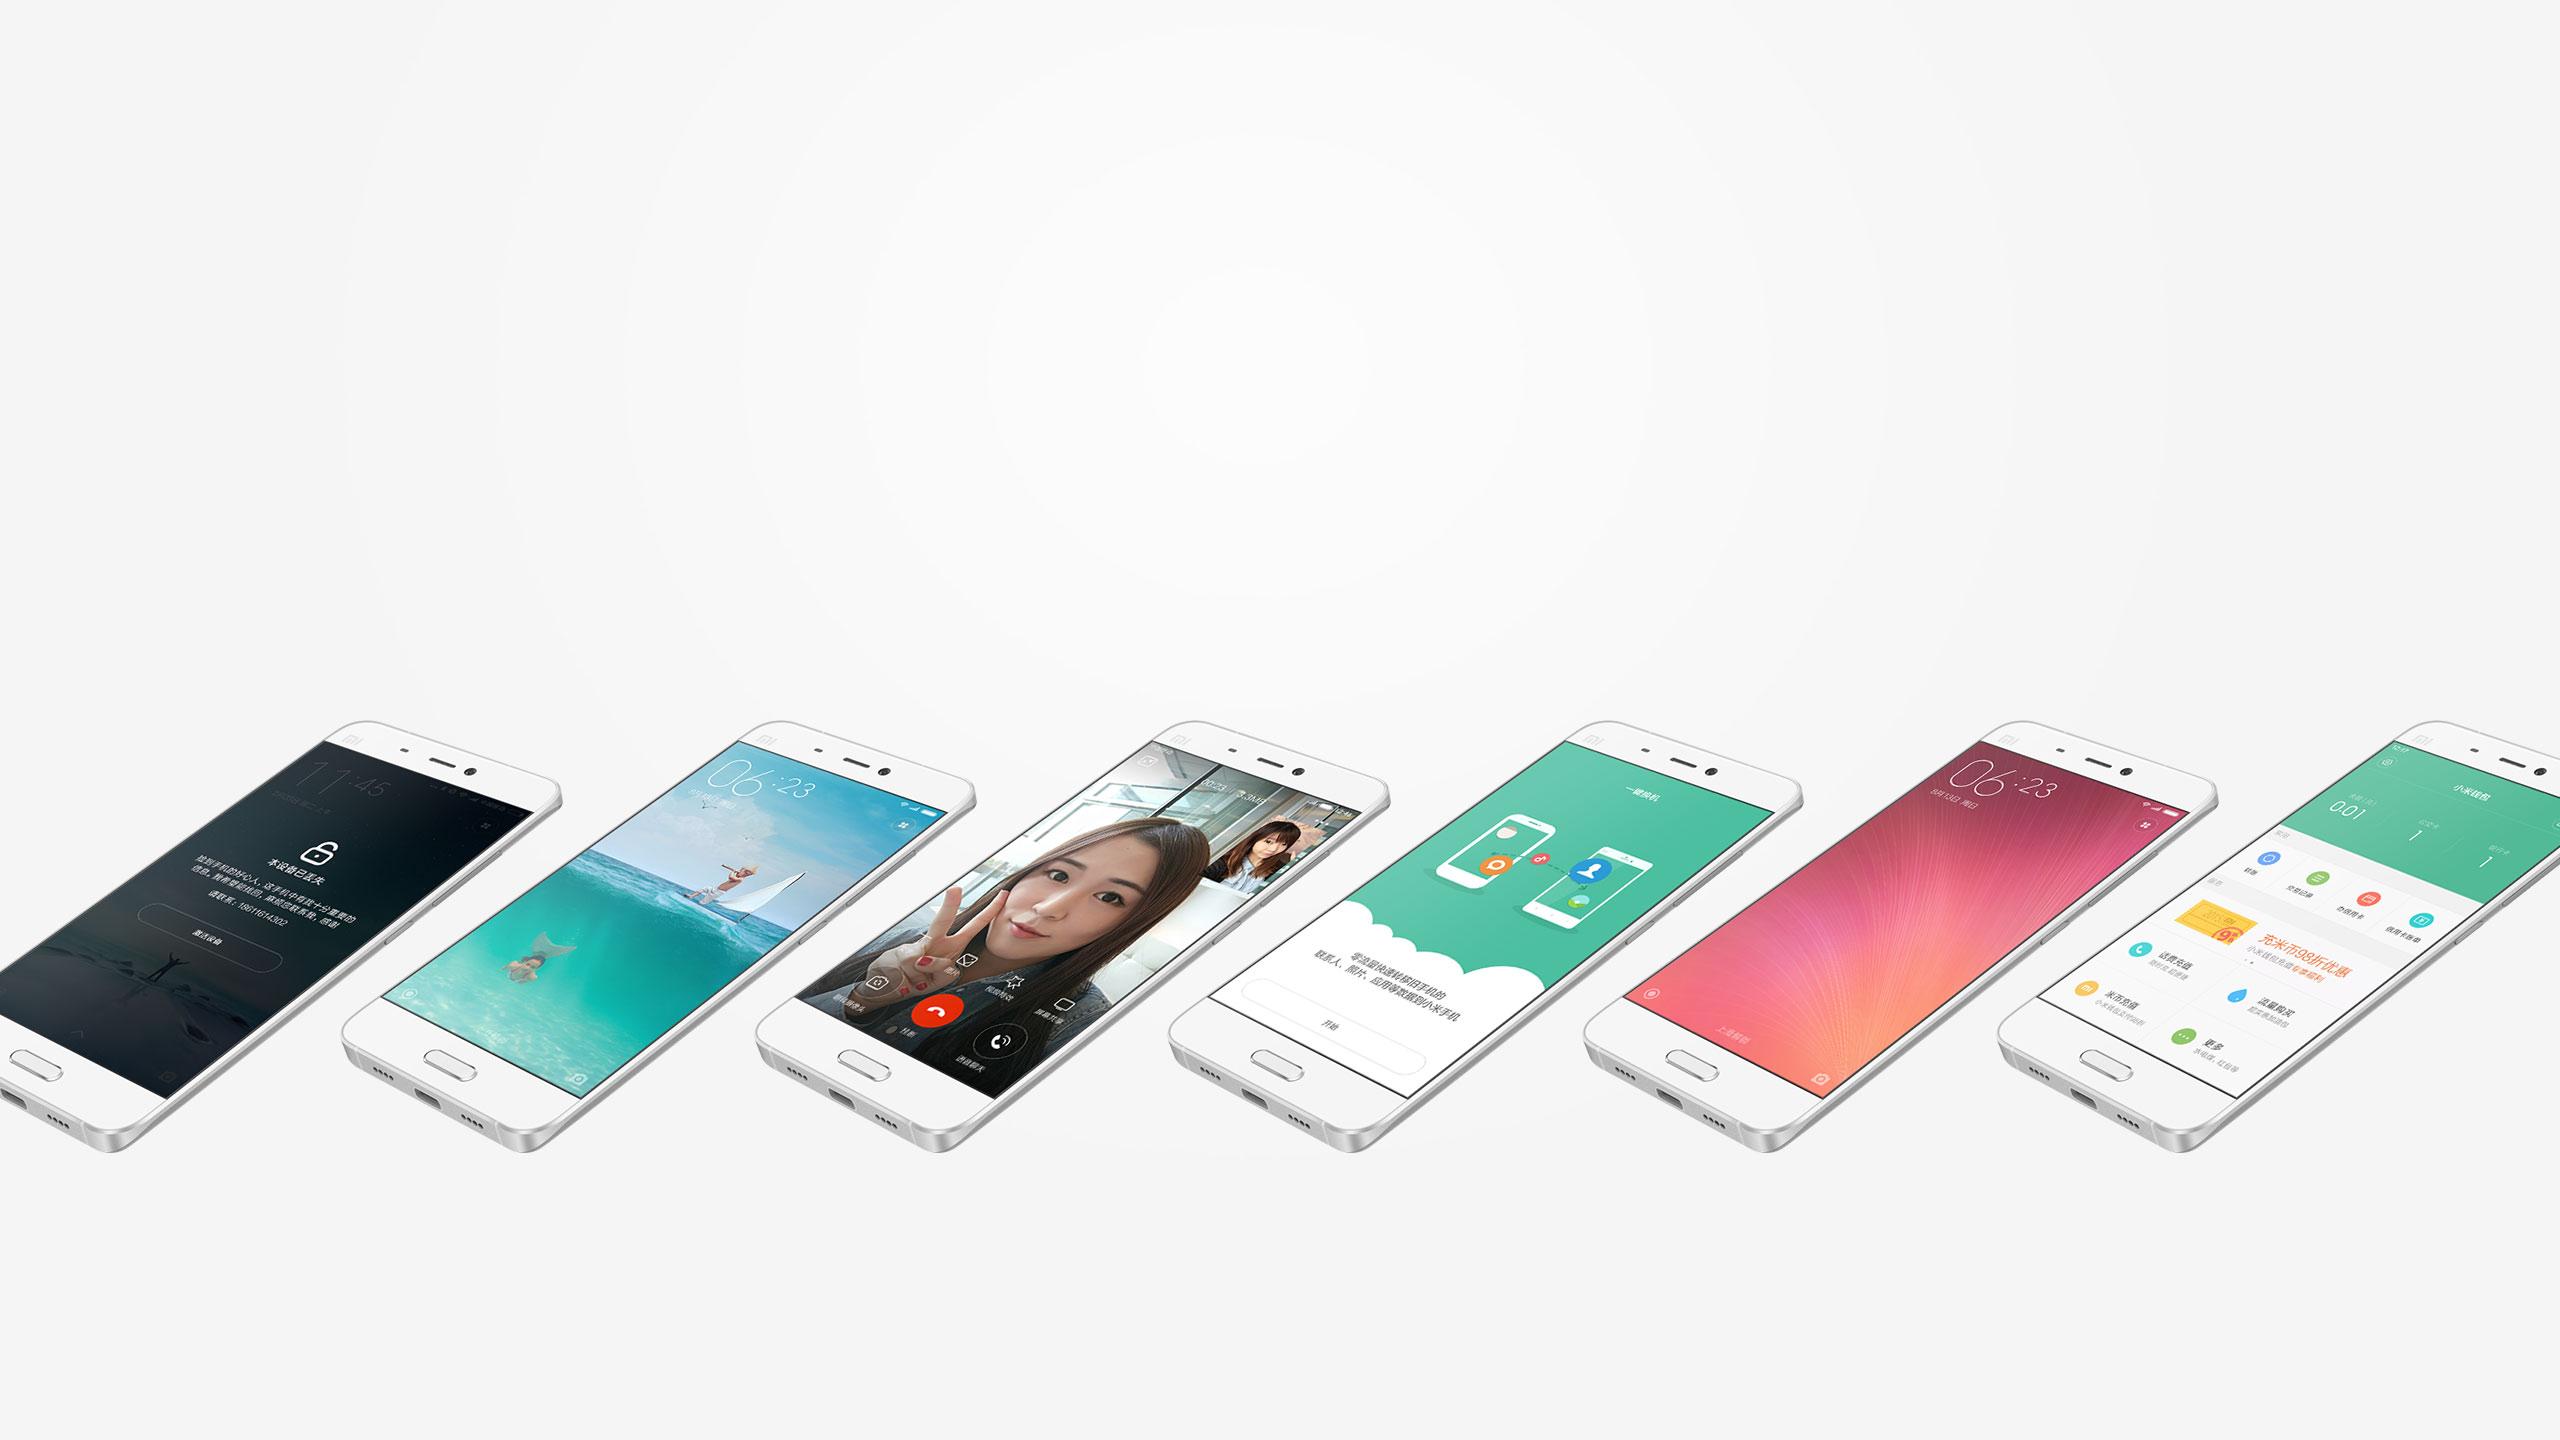 Xiaomi Mi5, Test, Testbericht, Antutu Benchmark, Geekbench, MIUI 7